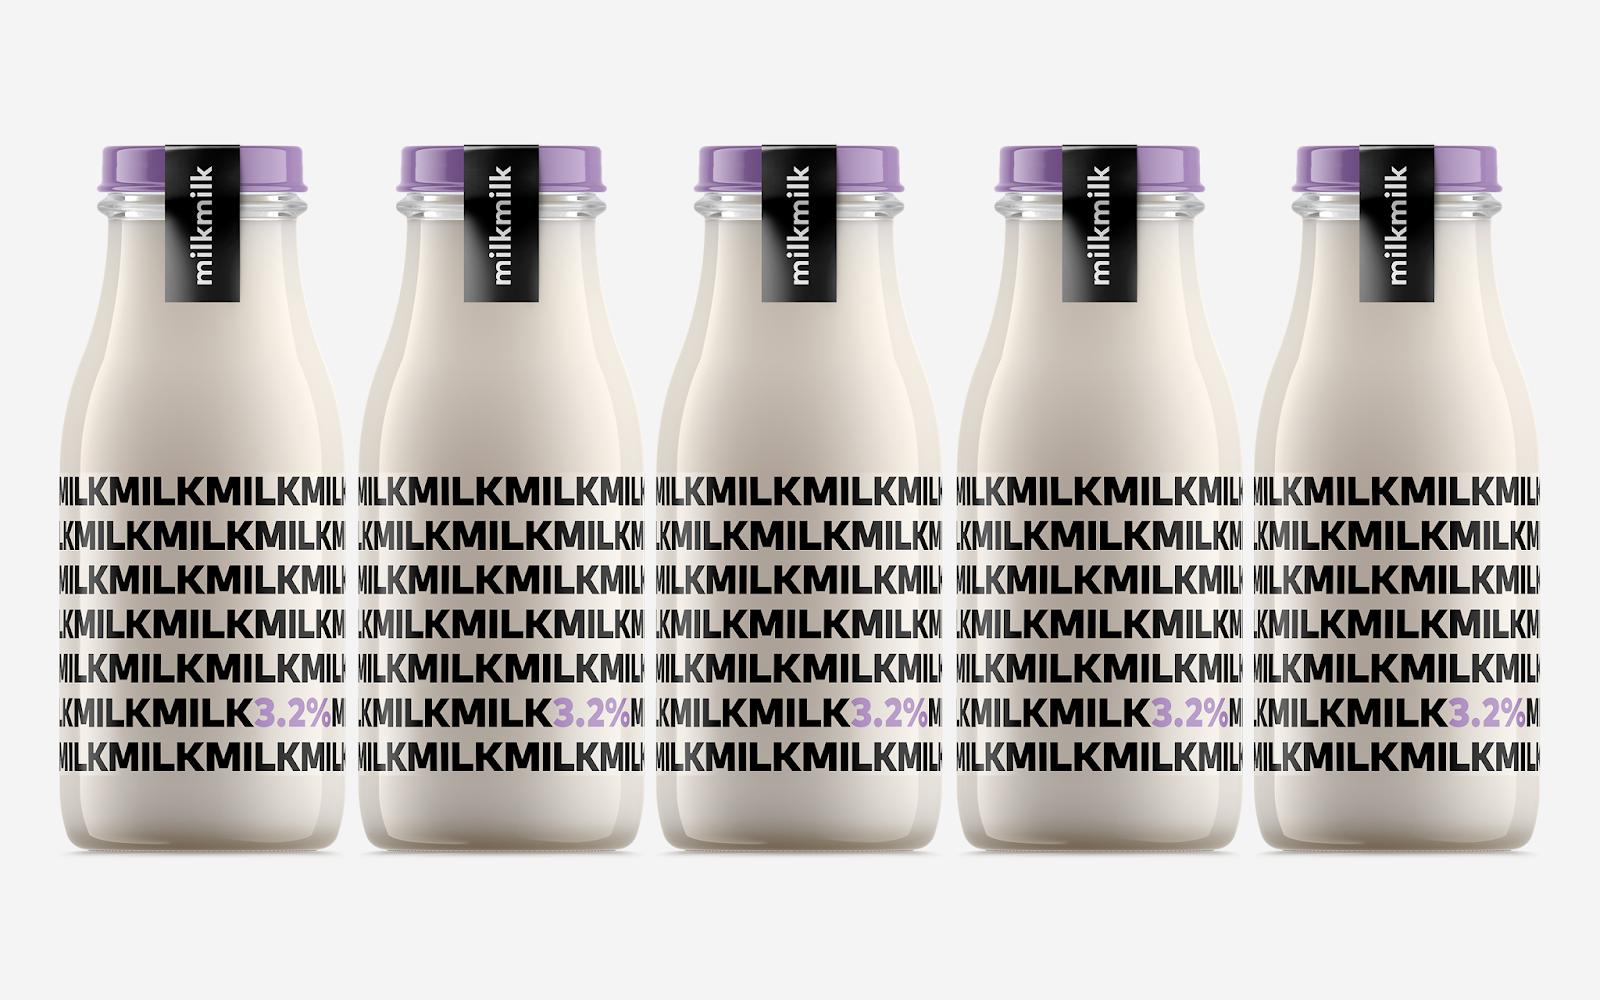 Milkmilk (lait) I Design (concept) : Rahim Ismayil Design, Azerbaijan (avril 2020)